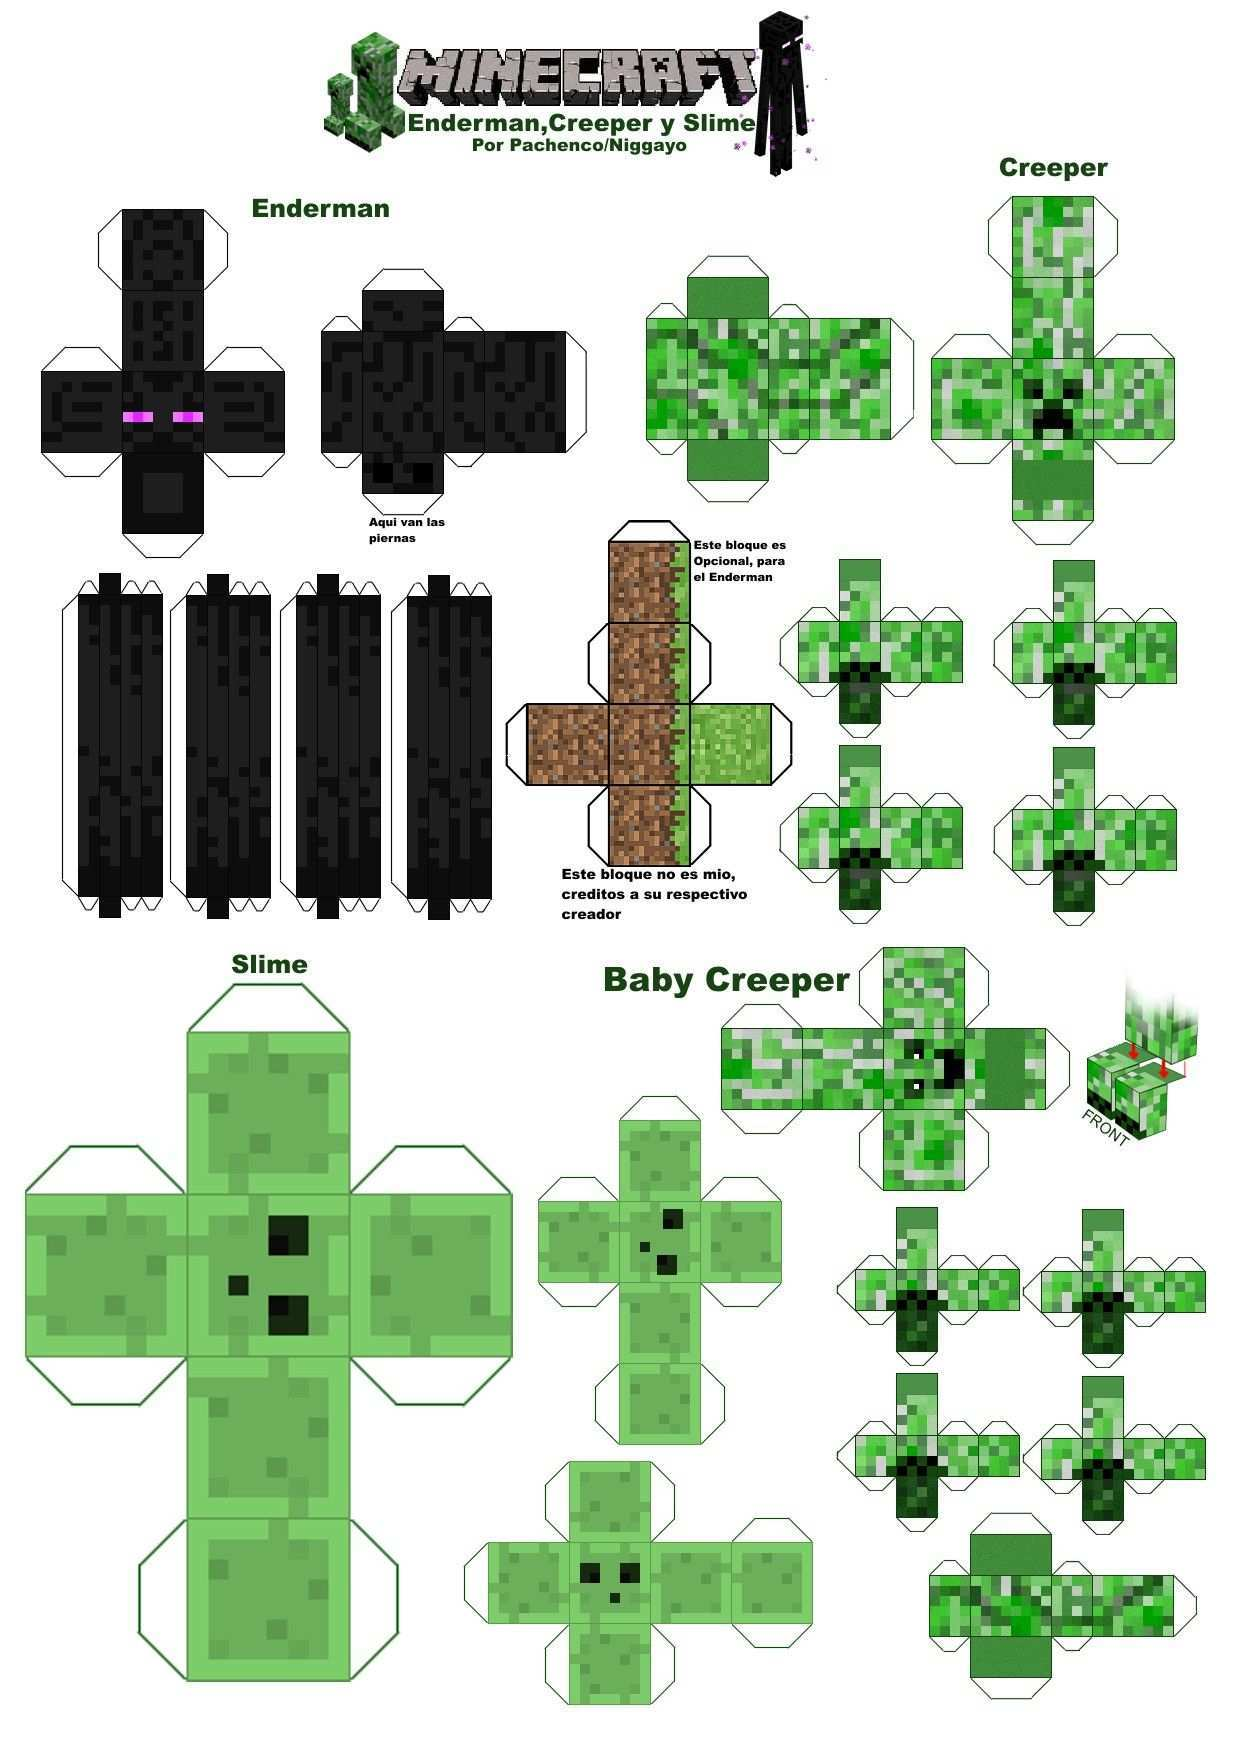 Pin By Liane Liebig On Baking Inspiration Minecraft Printables Minecraft Crafts Minecraft Party